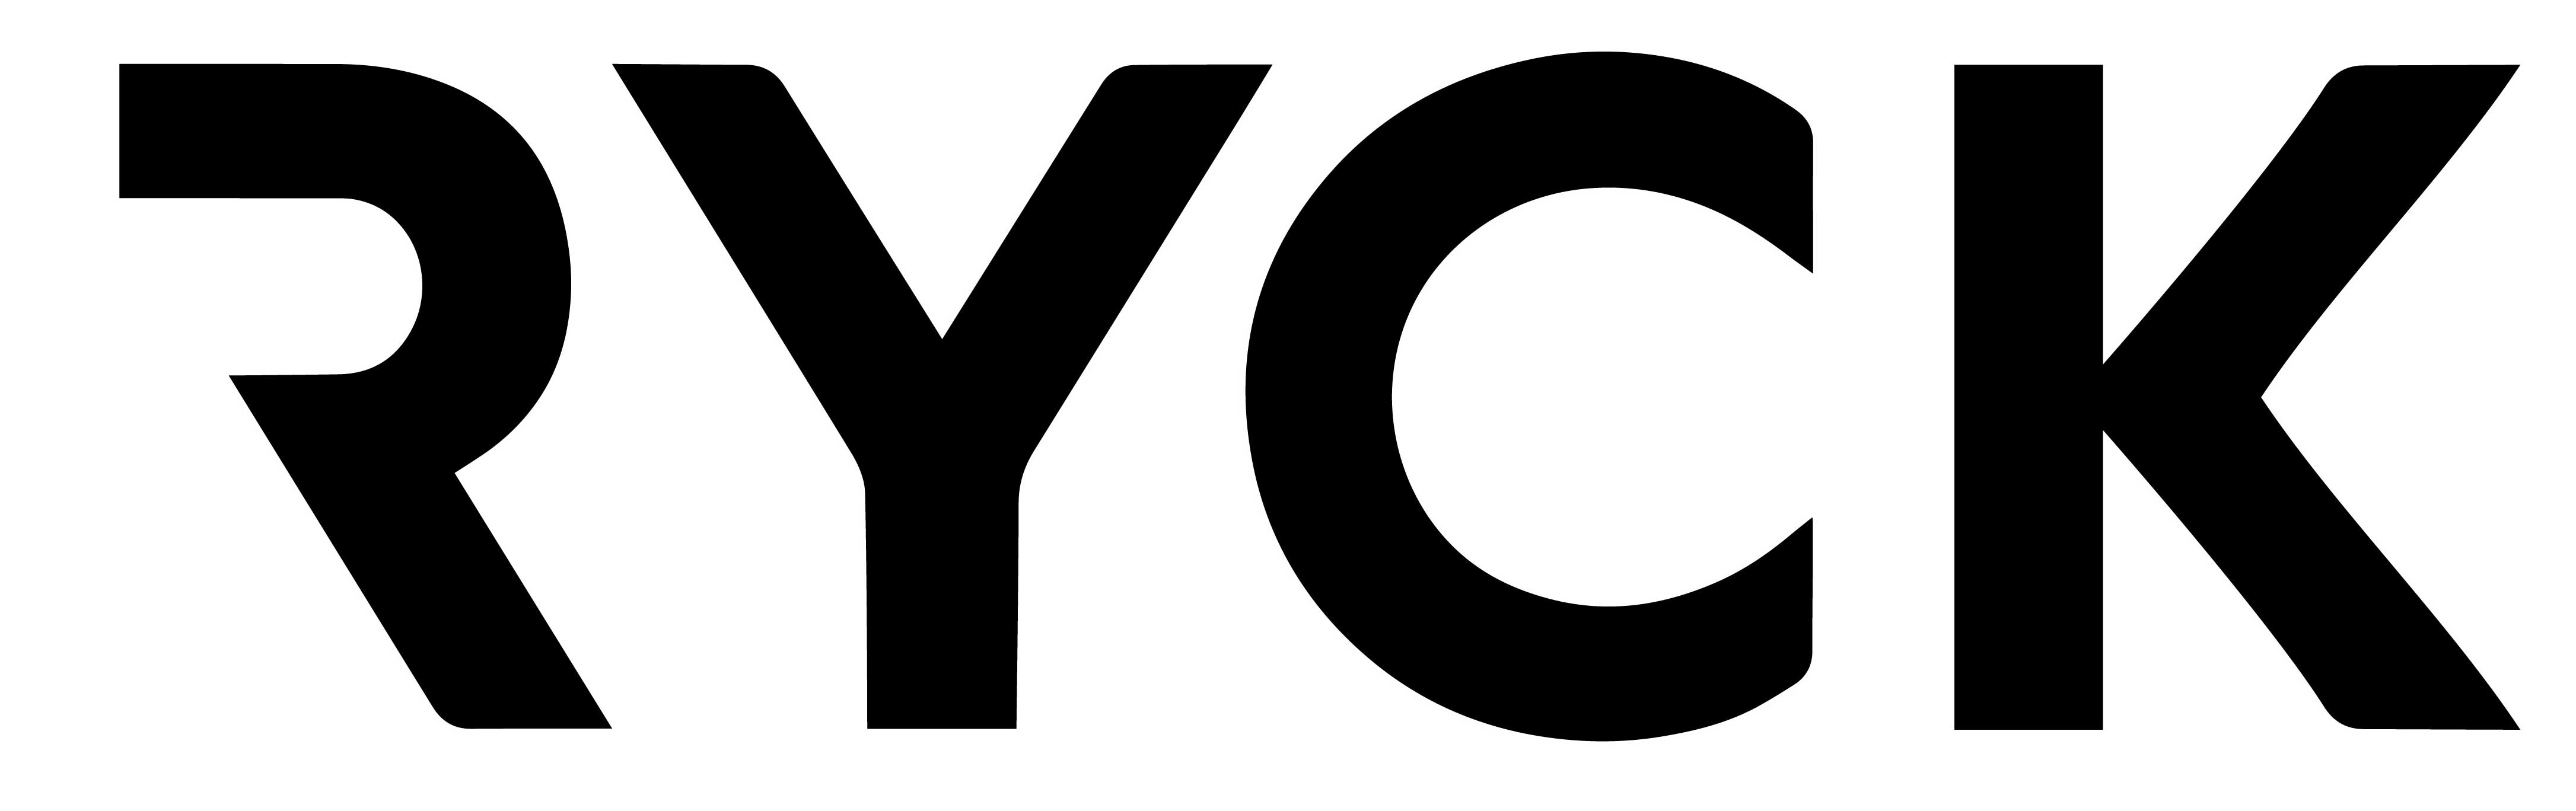 Ryck-Yachts